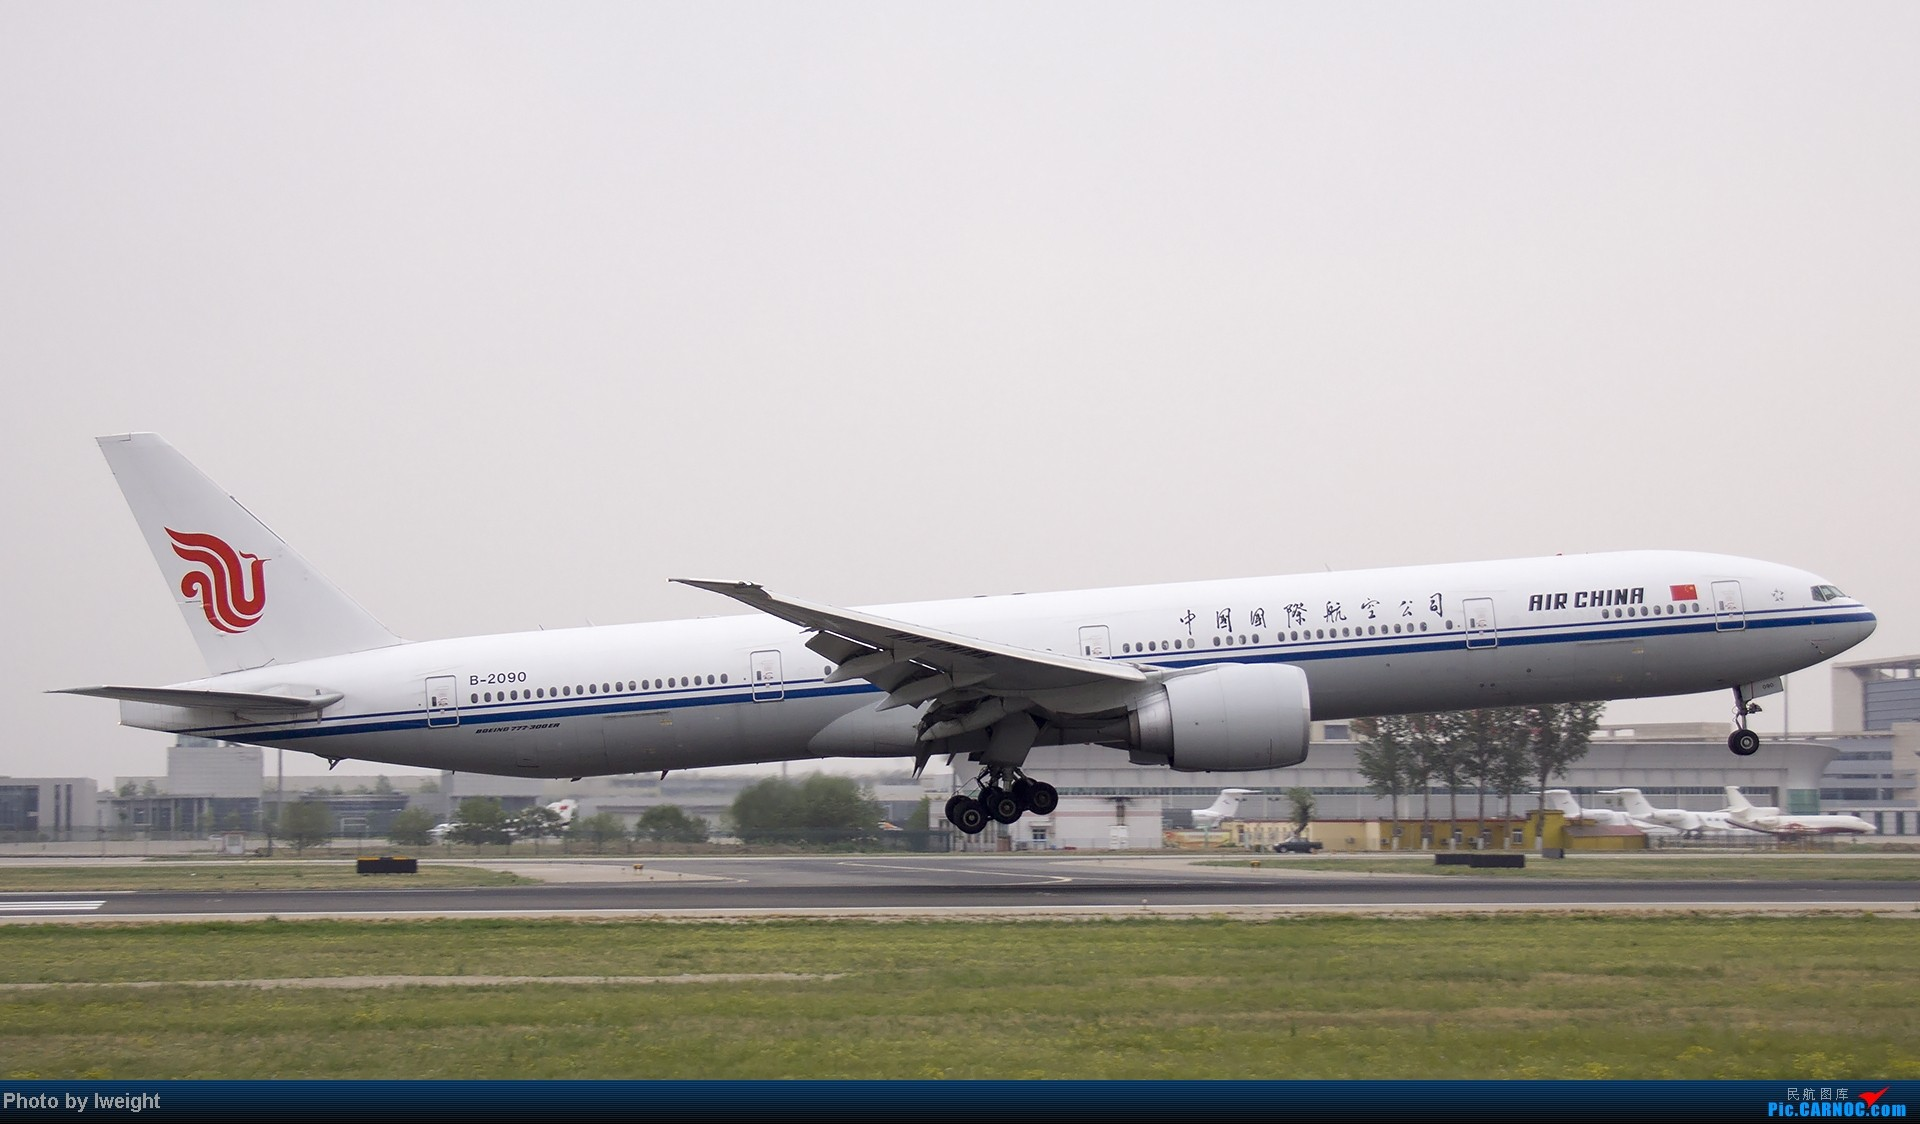 Re:[原创]5月3日首都机场风云变幻的下午 BOEING 777-300 B-2090 中国北京首都机场